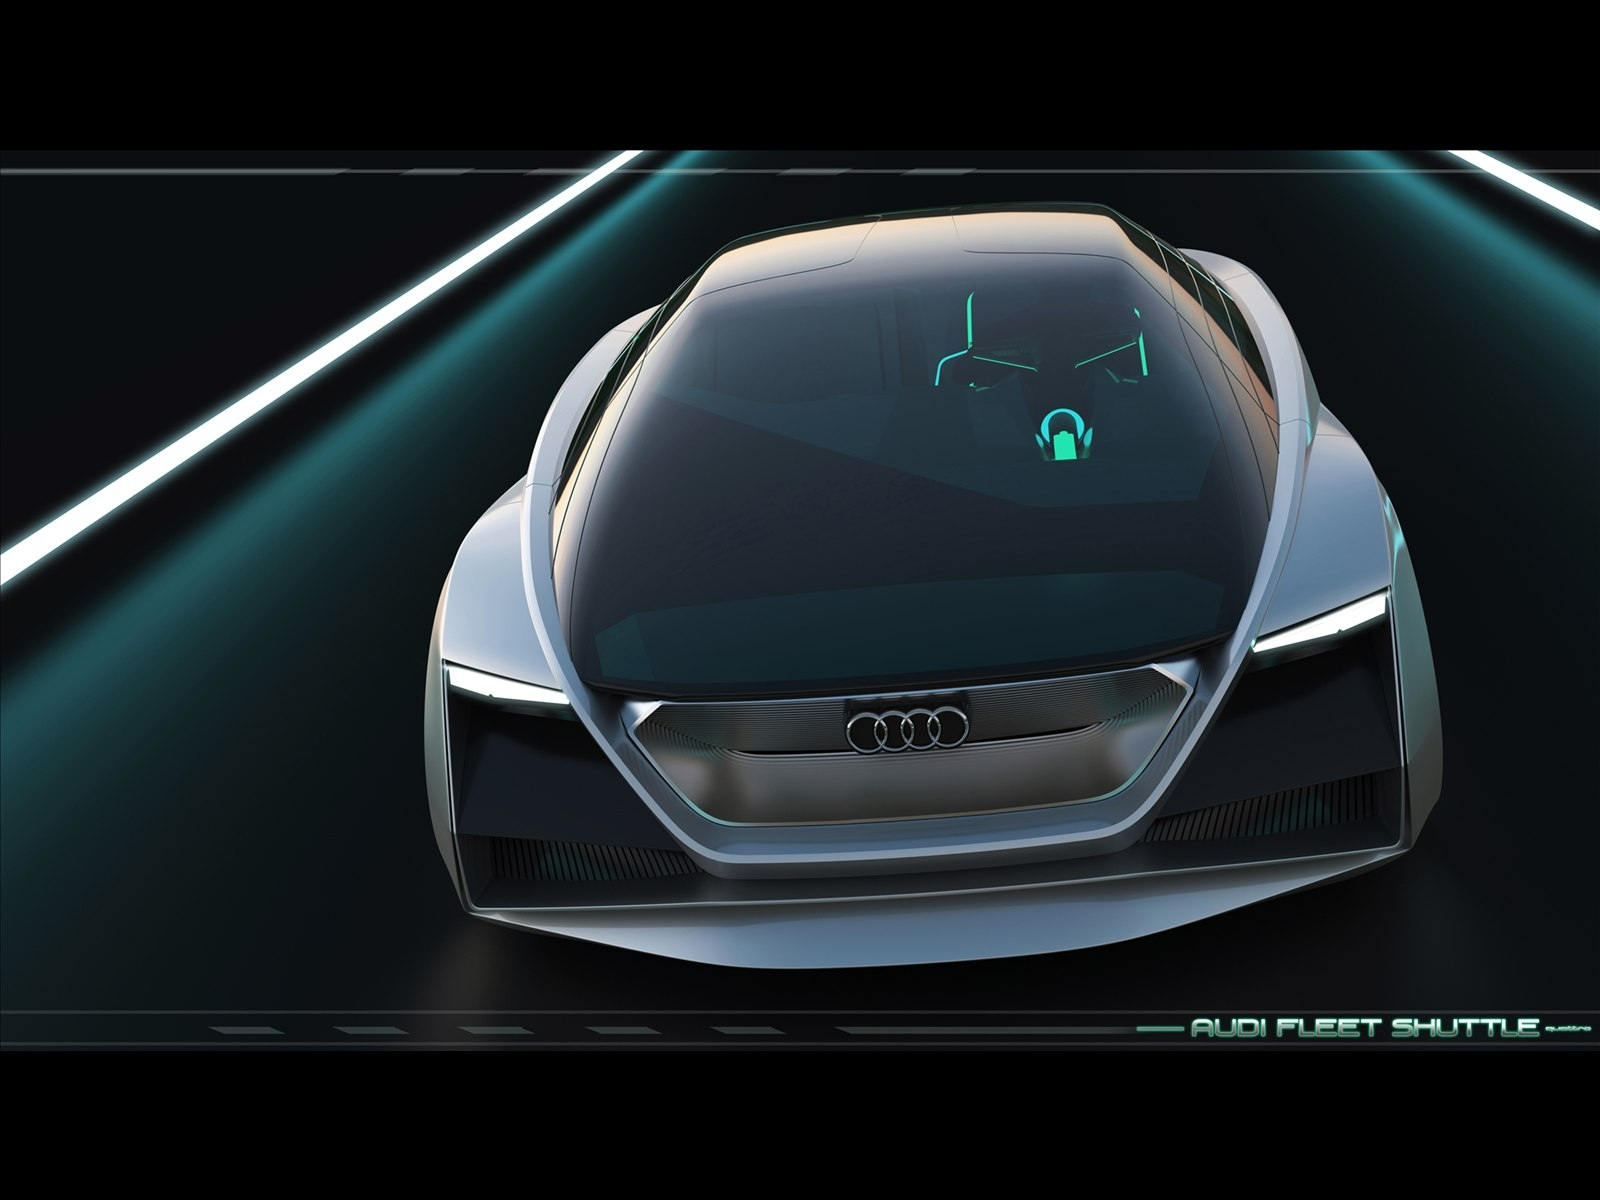 audi-fleet-shuttle-quattro-Audi-Fleet-Shuttle-Quattro-Exotic-Car-Image-O-wallpaper-wpc5801231